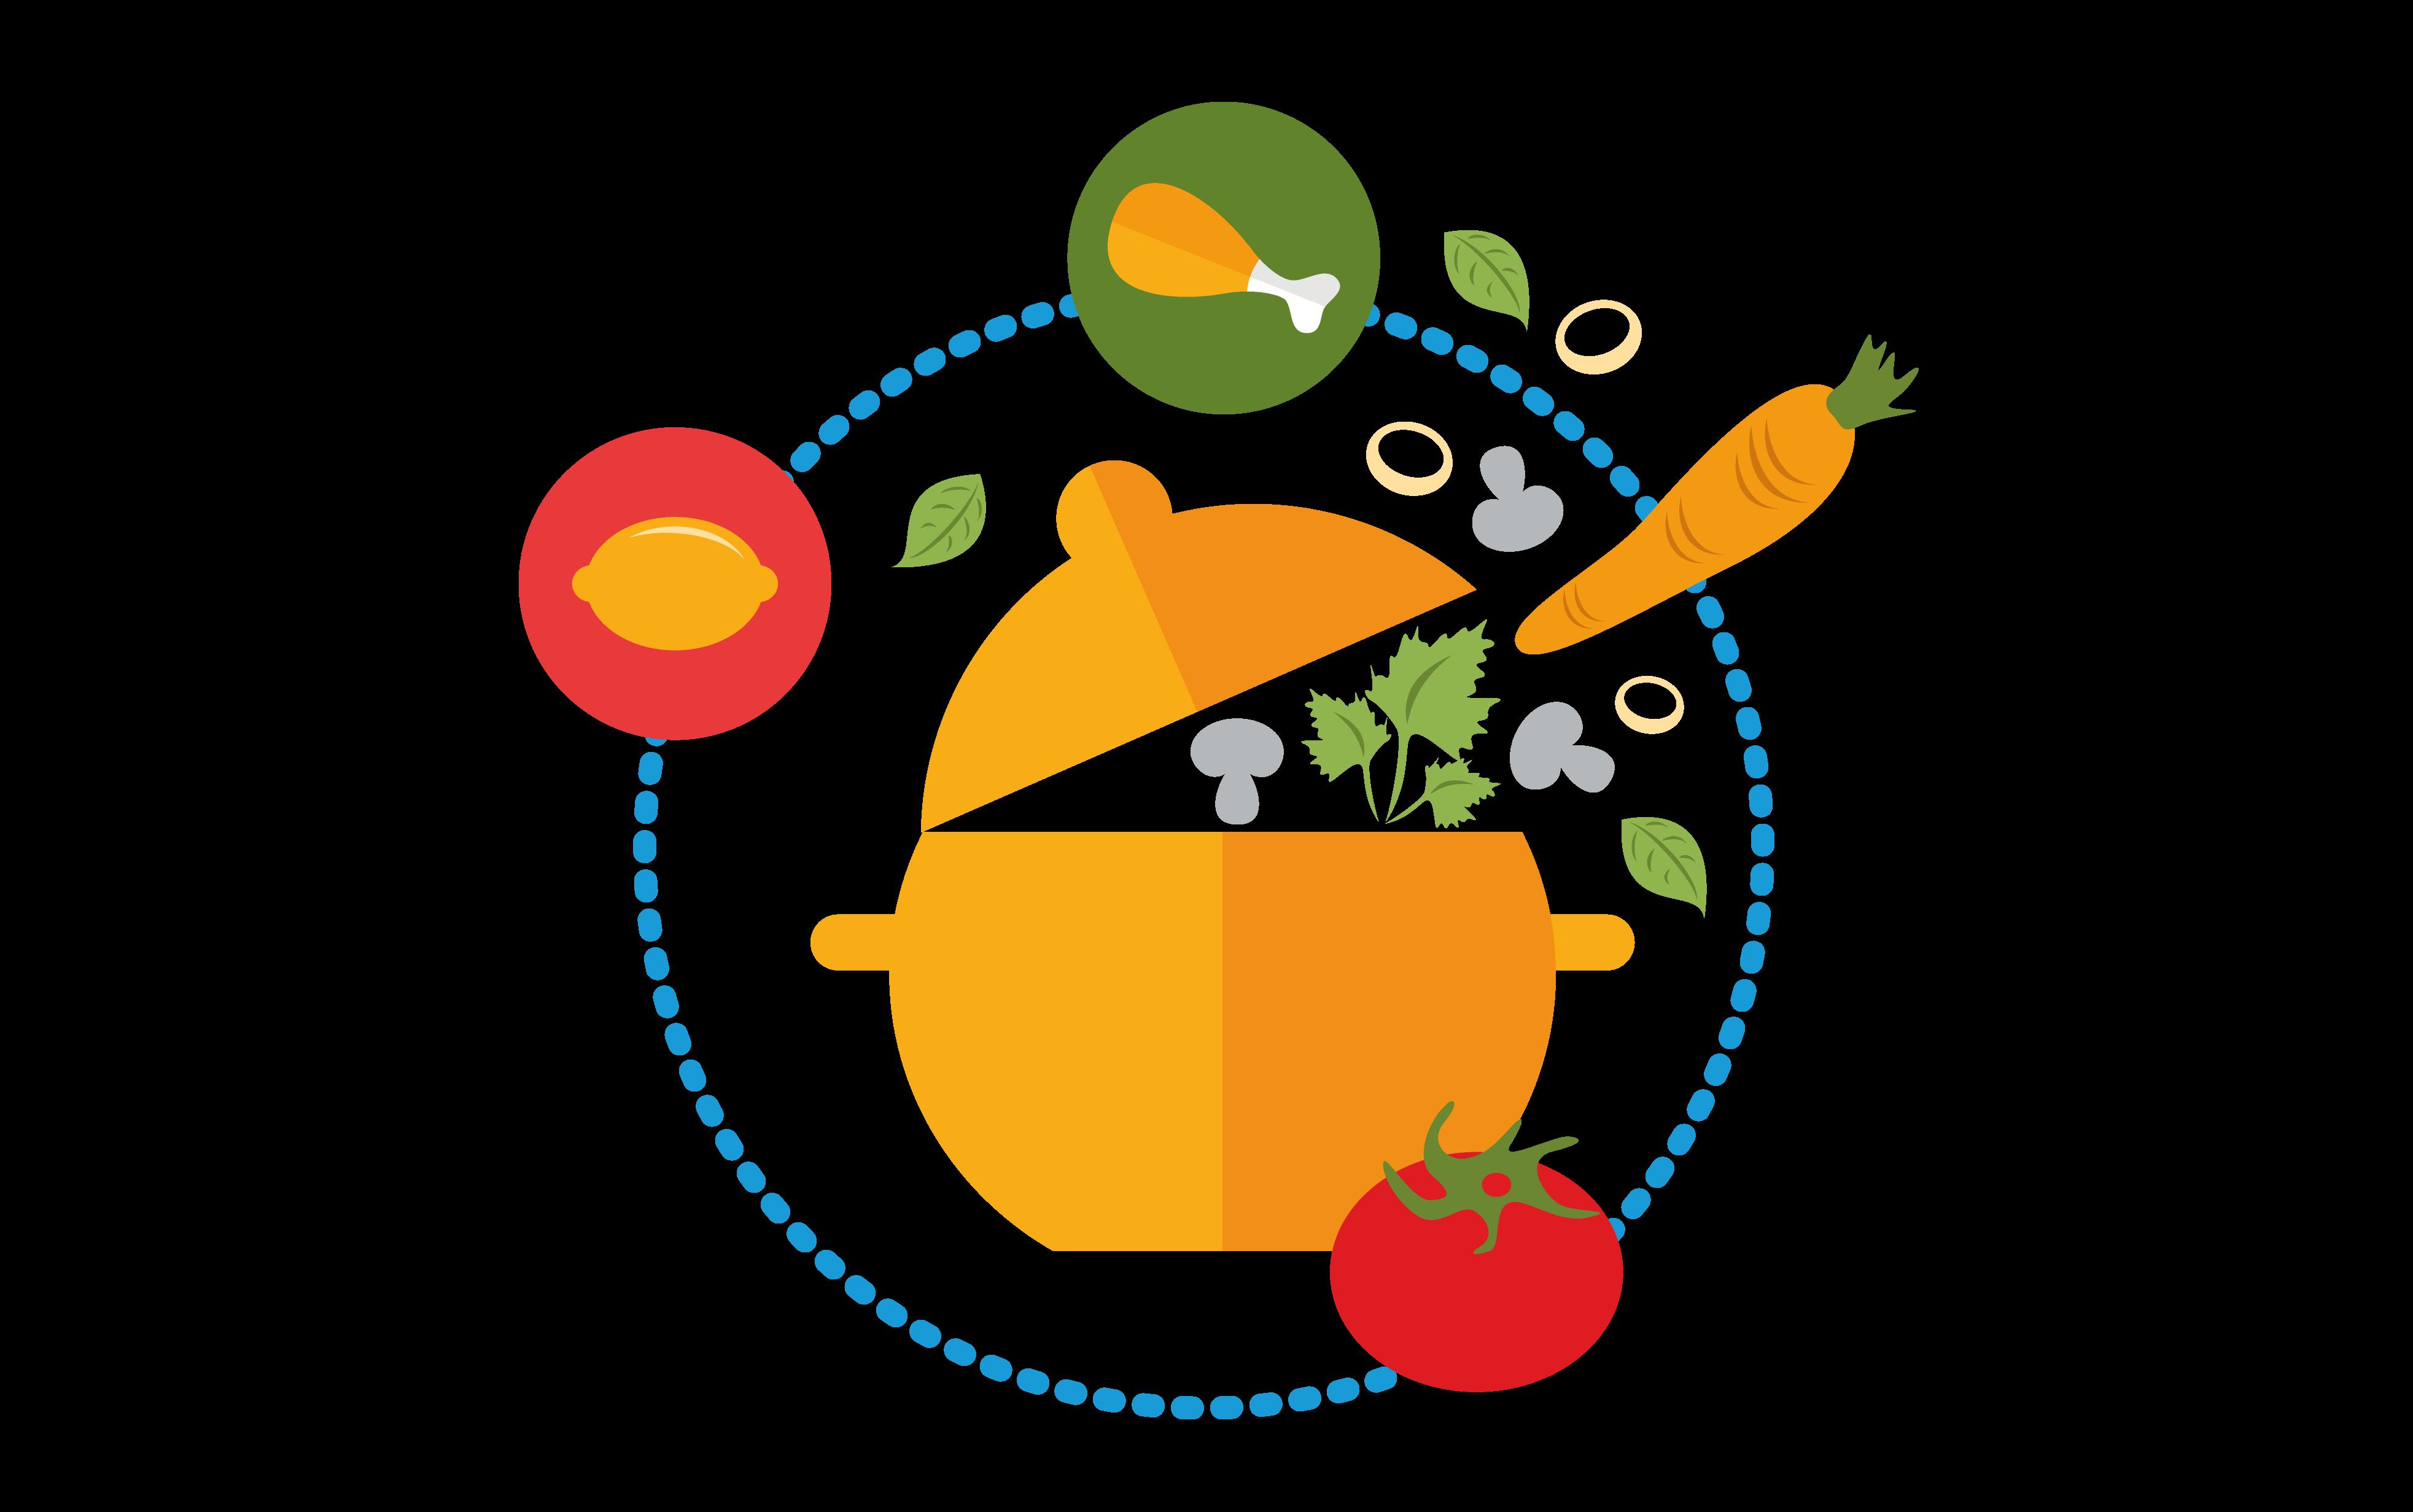 Proikos son tus h bitos de alimentaci n saludables for Tecnicas culinarias pdf